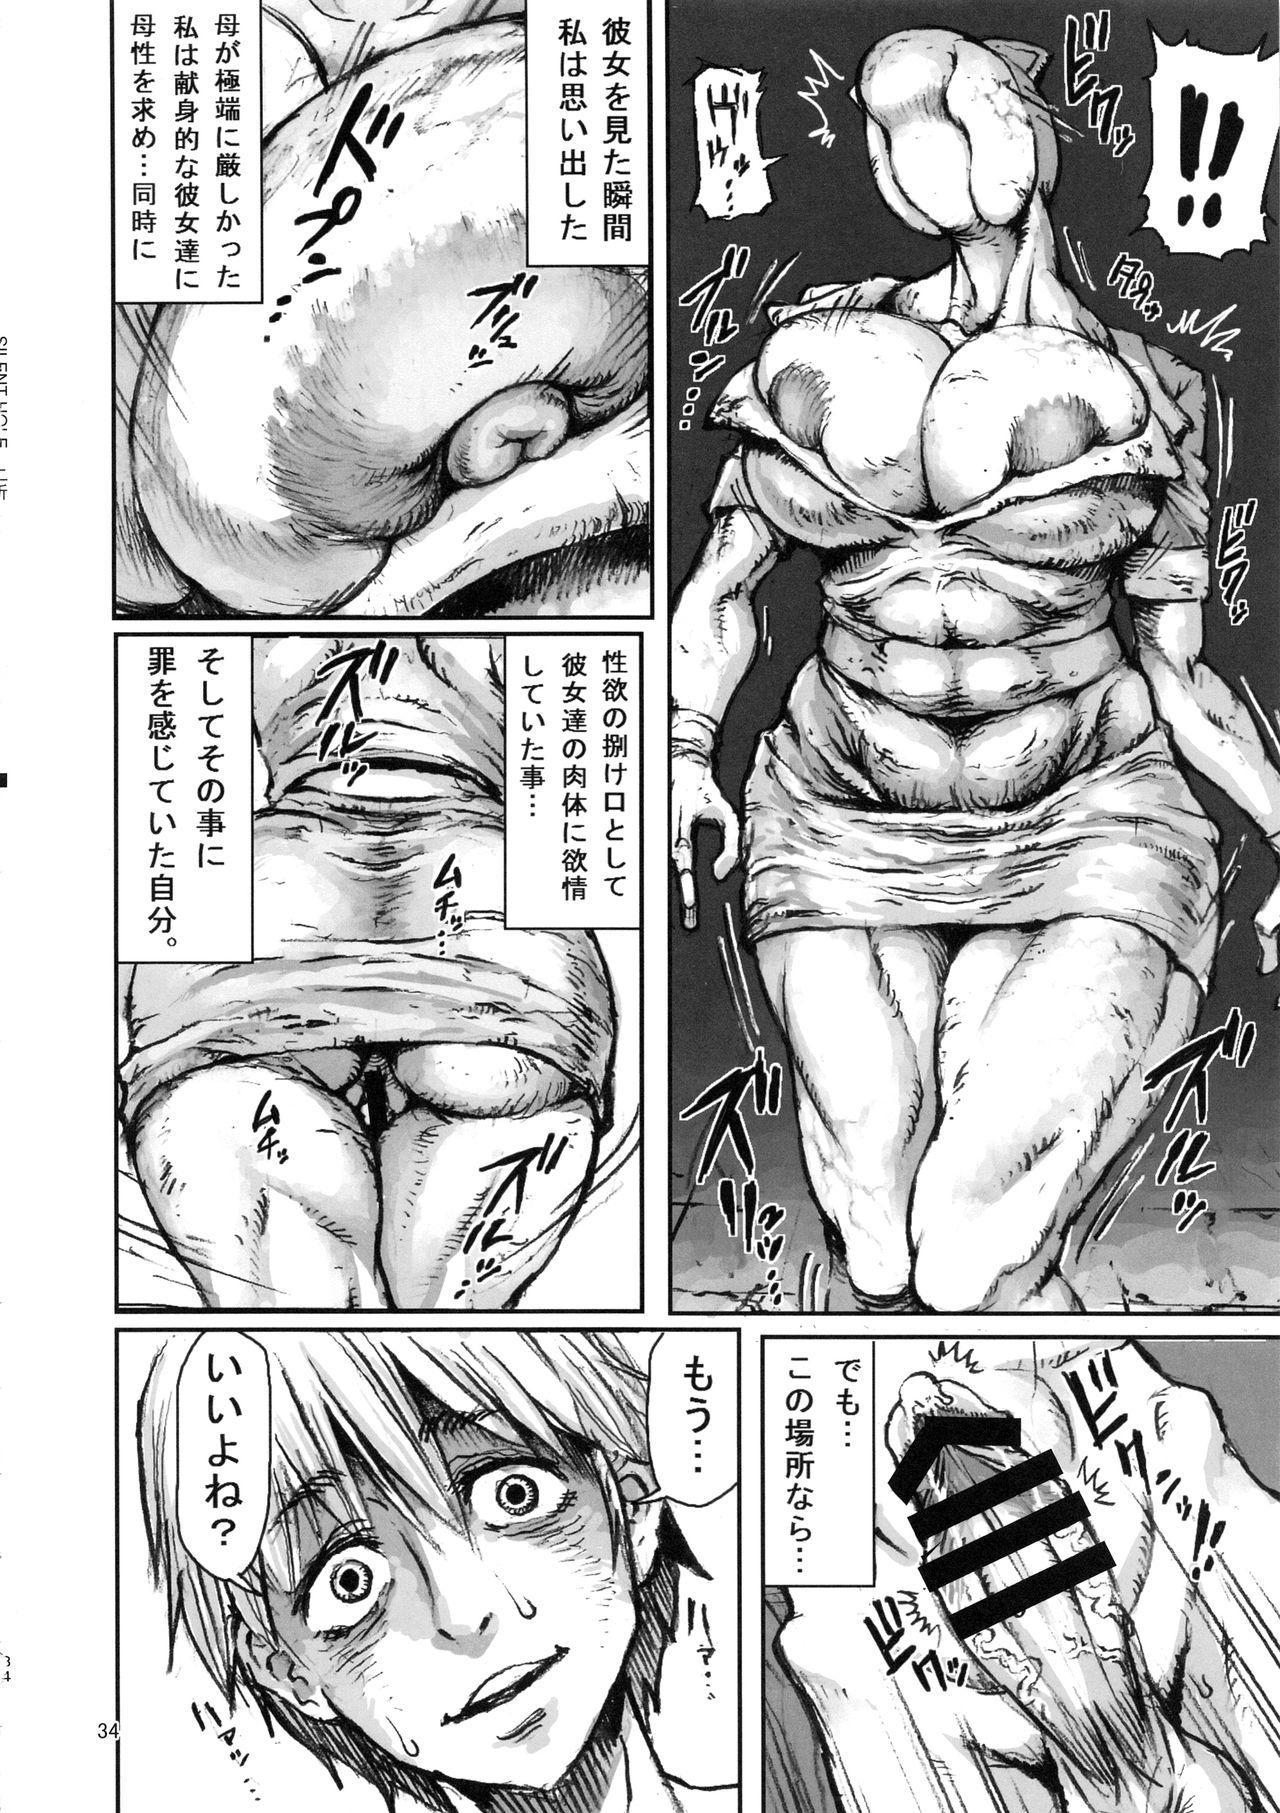 SILENT HOLE Bubble Head Nurse Ryoujoku Choukyou Kiroku 32